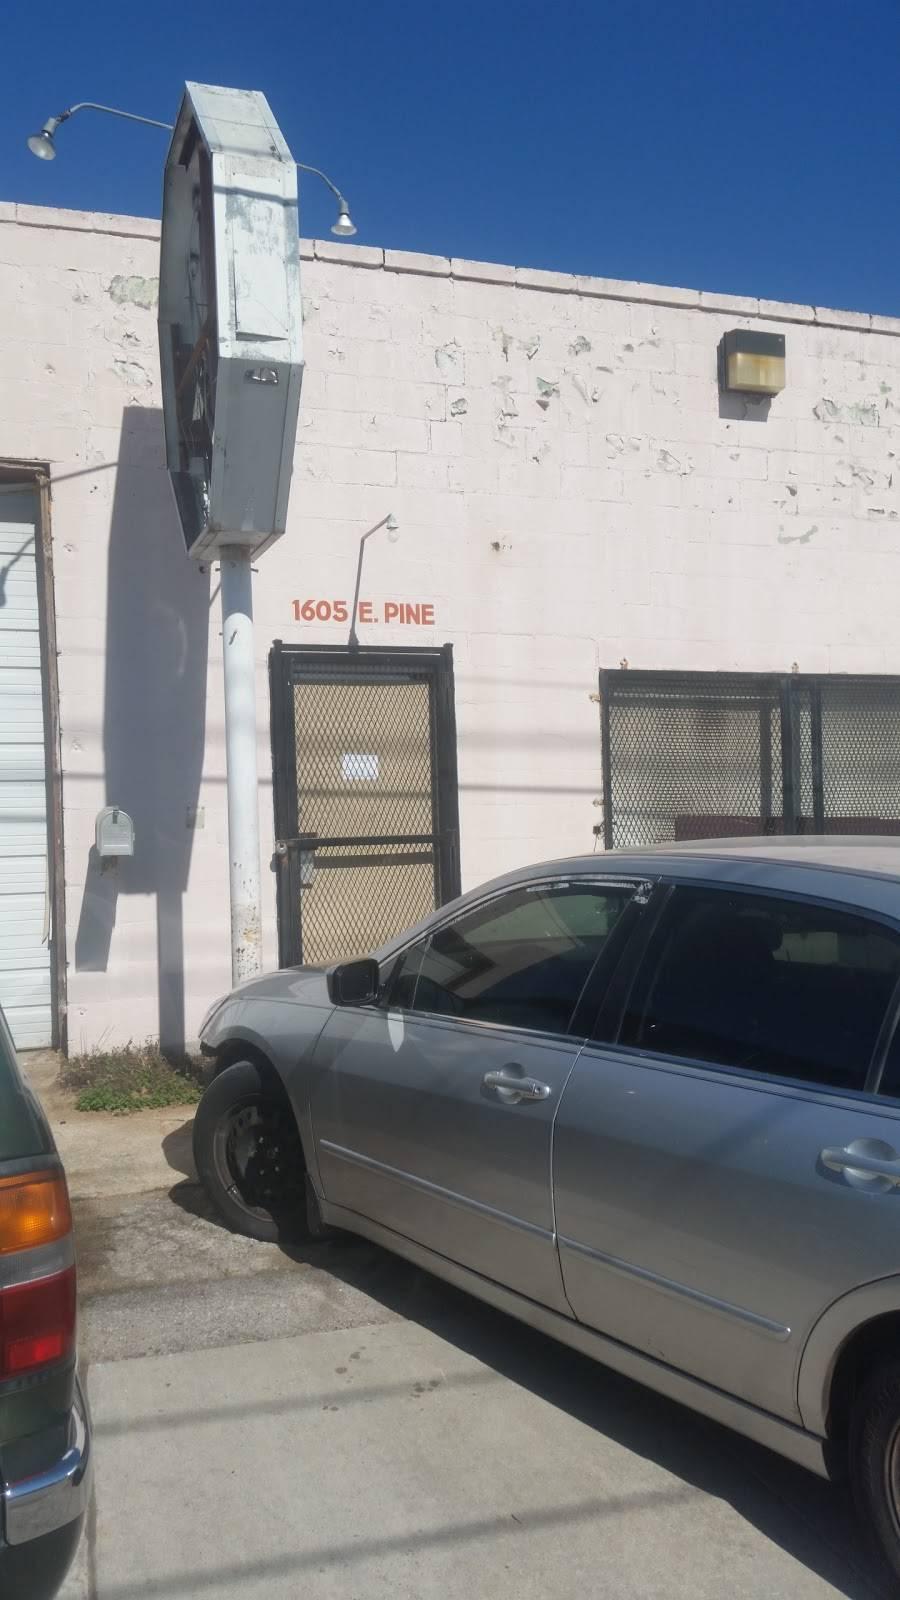 Pine Street Auto Recyclers & Salvage Inc - car repair  | Photo 8 of 10 | Address: 1561 E Pine St, Tulsa, OK 74106, USA | Phone: (918) 794-7770